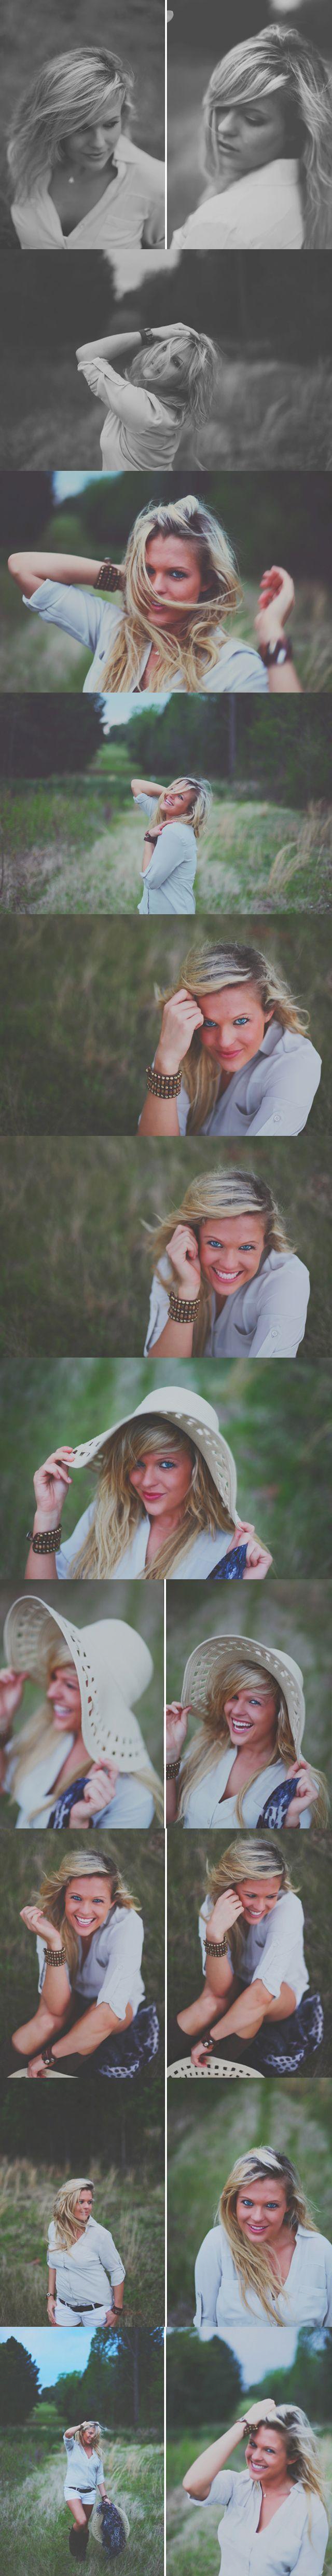 Kendra Michelle Photography|Portrait Photography Inspiration